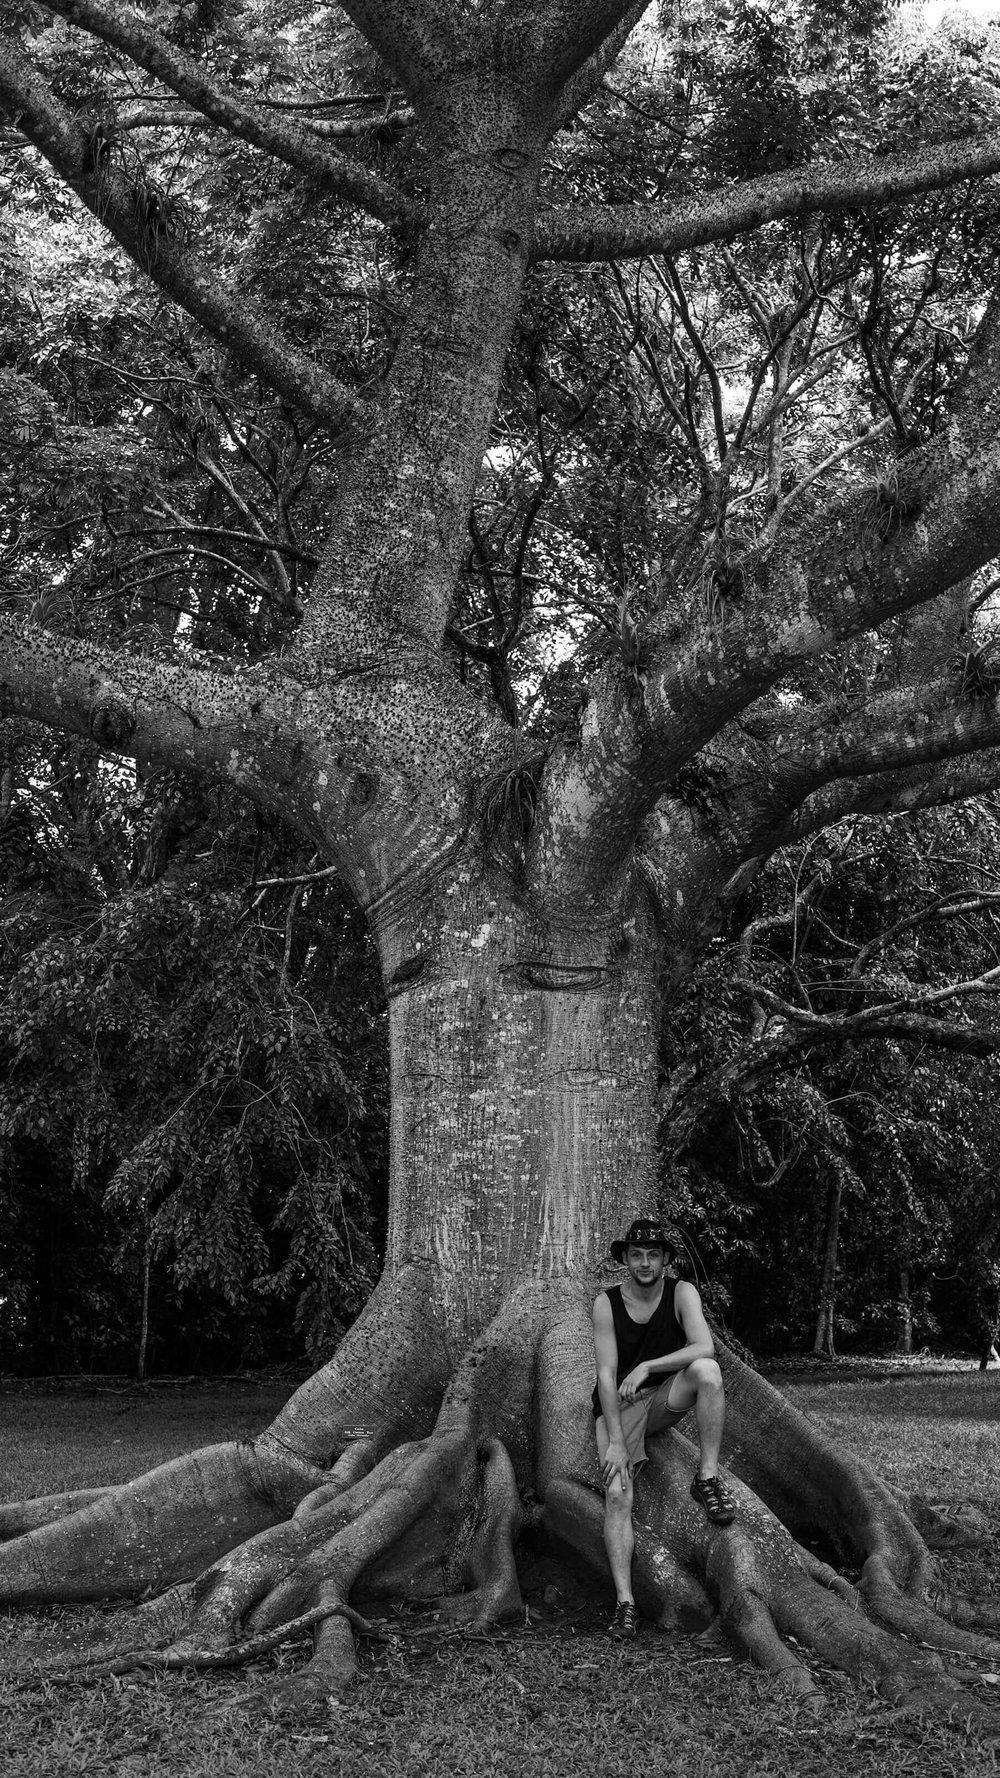 engle-olson-photography-puerto-rico-20.jpg